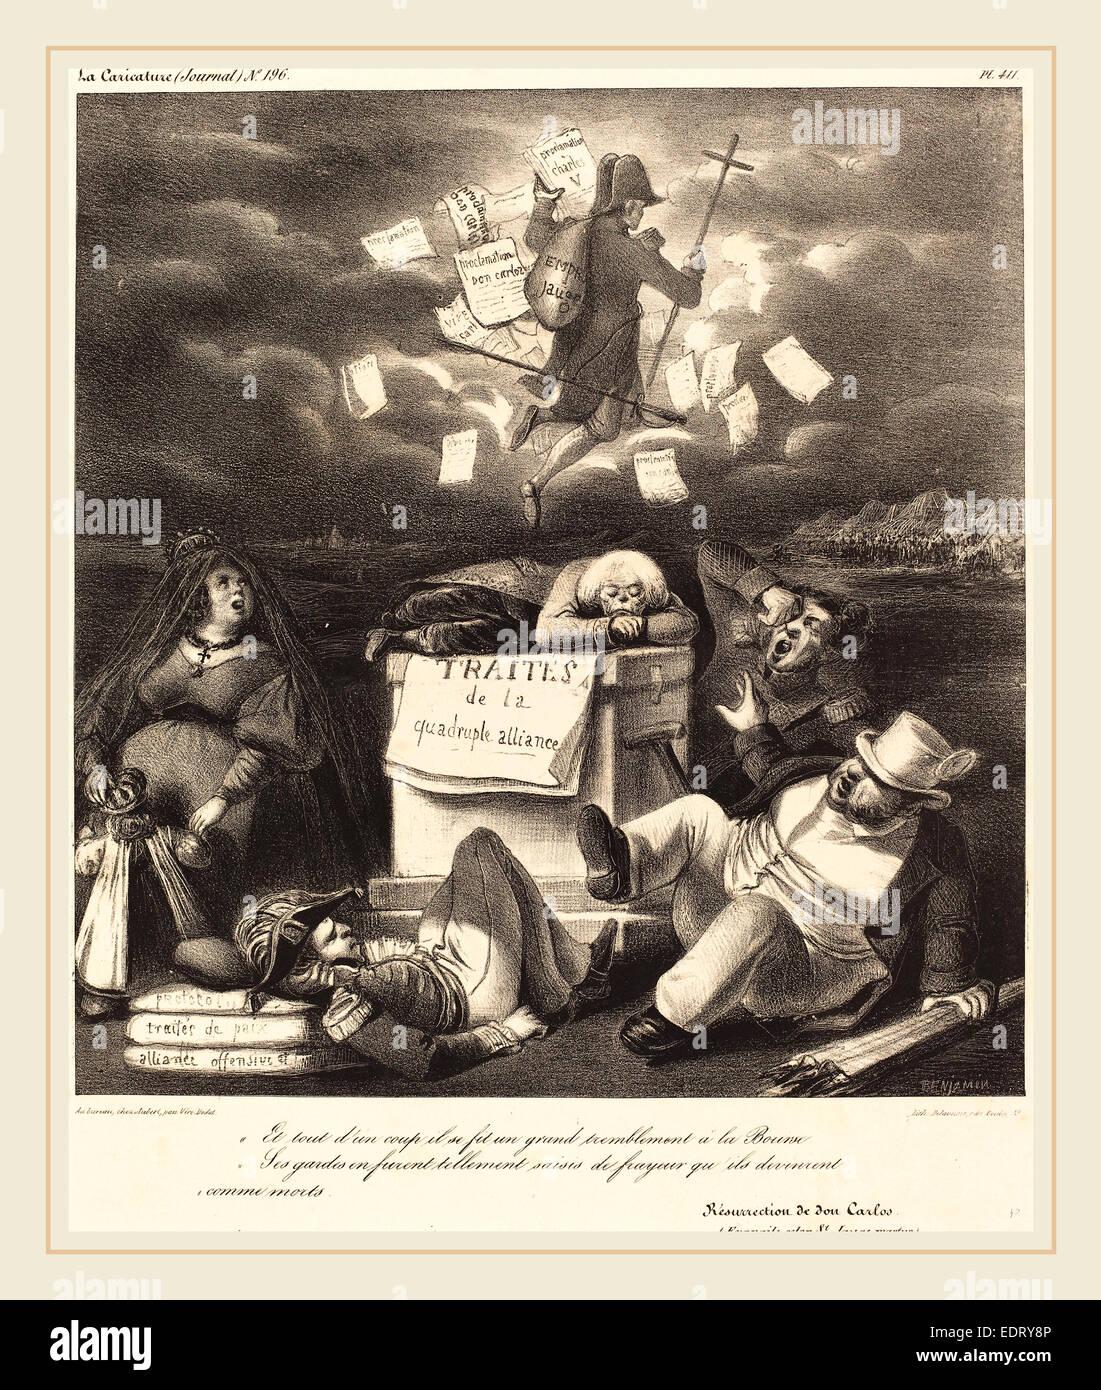 Benjamin Roubaud, Résurrection de don Carlo, 1830s, lithograph - Stock Image